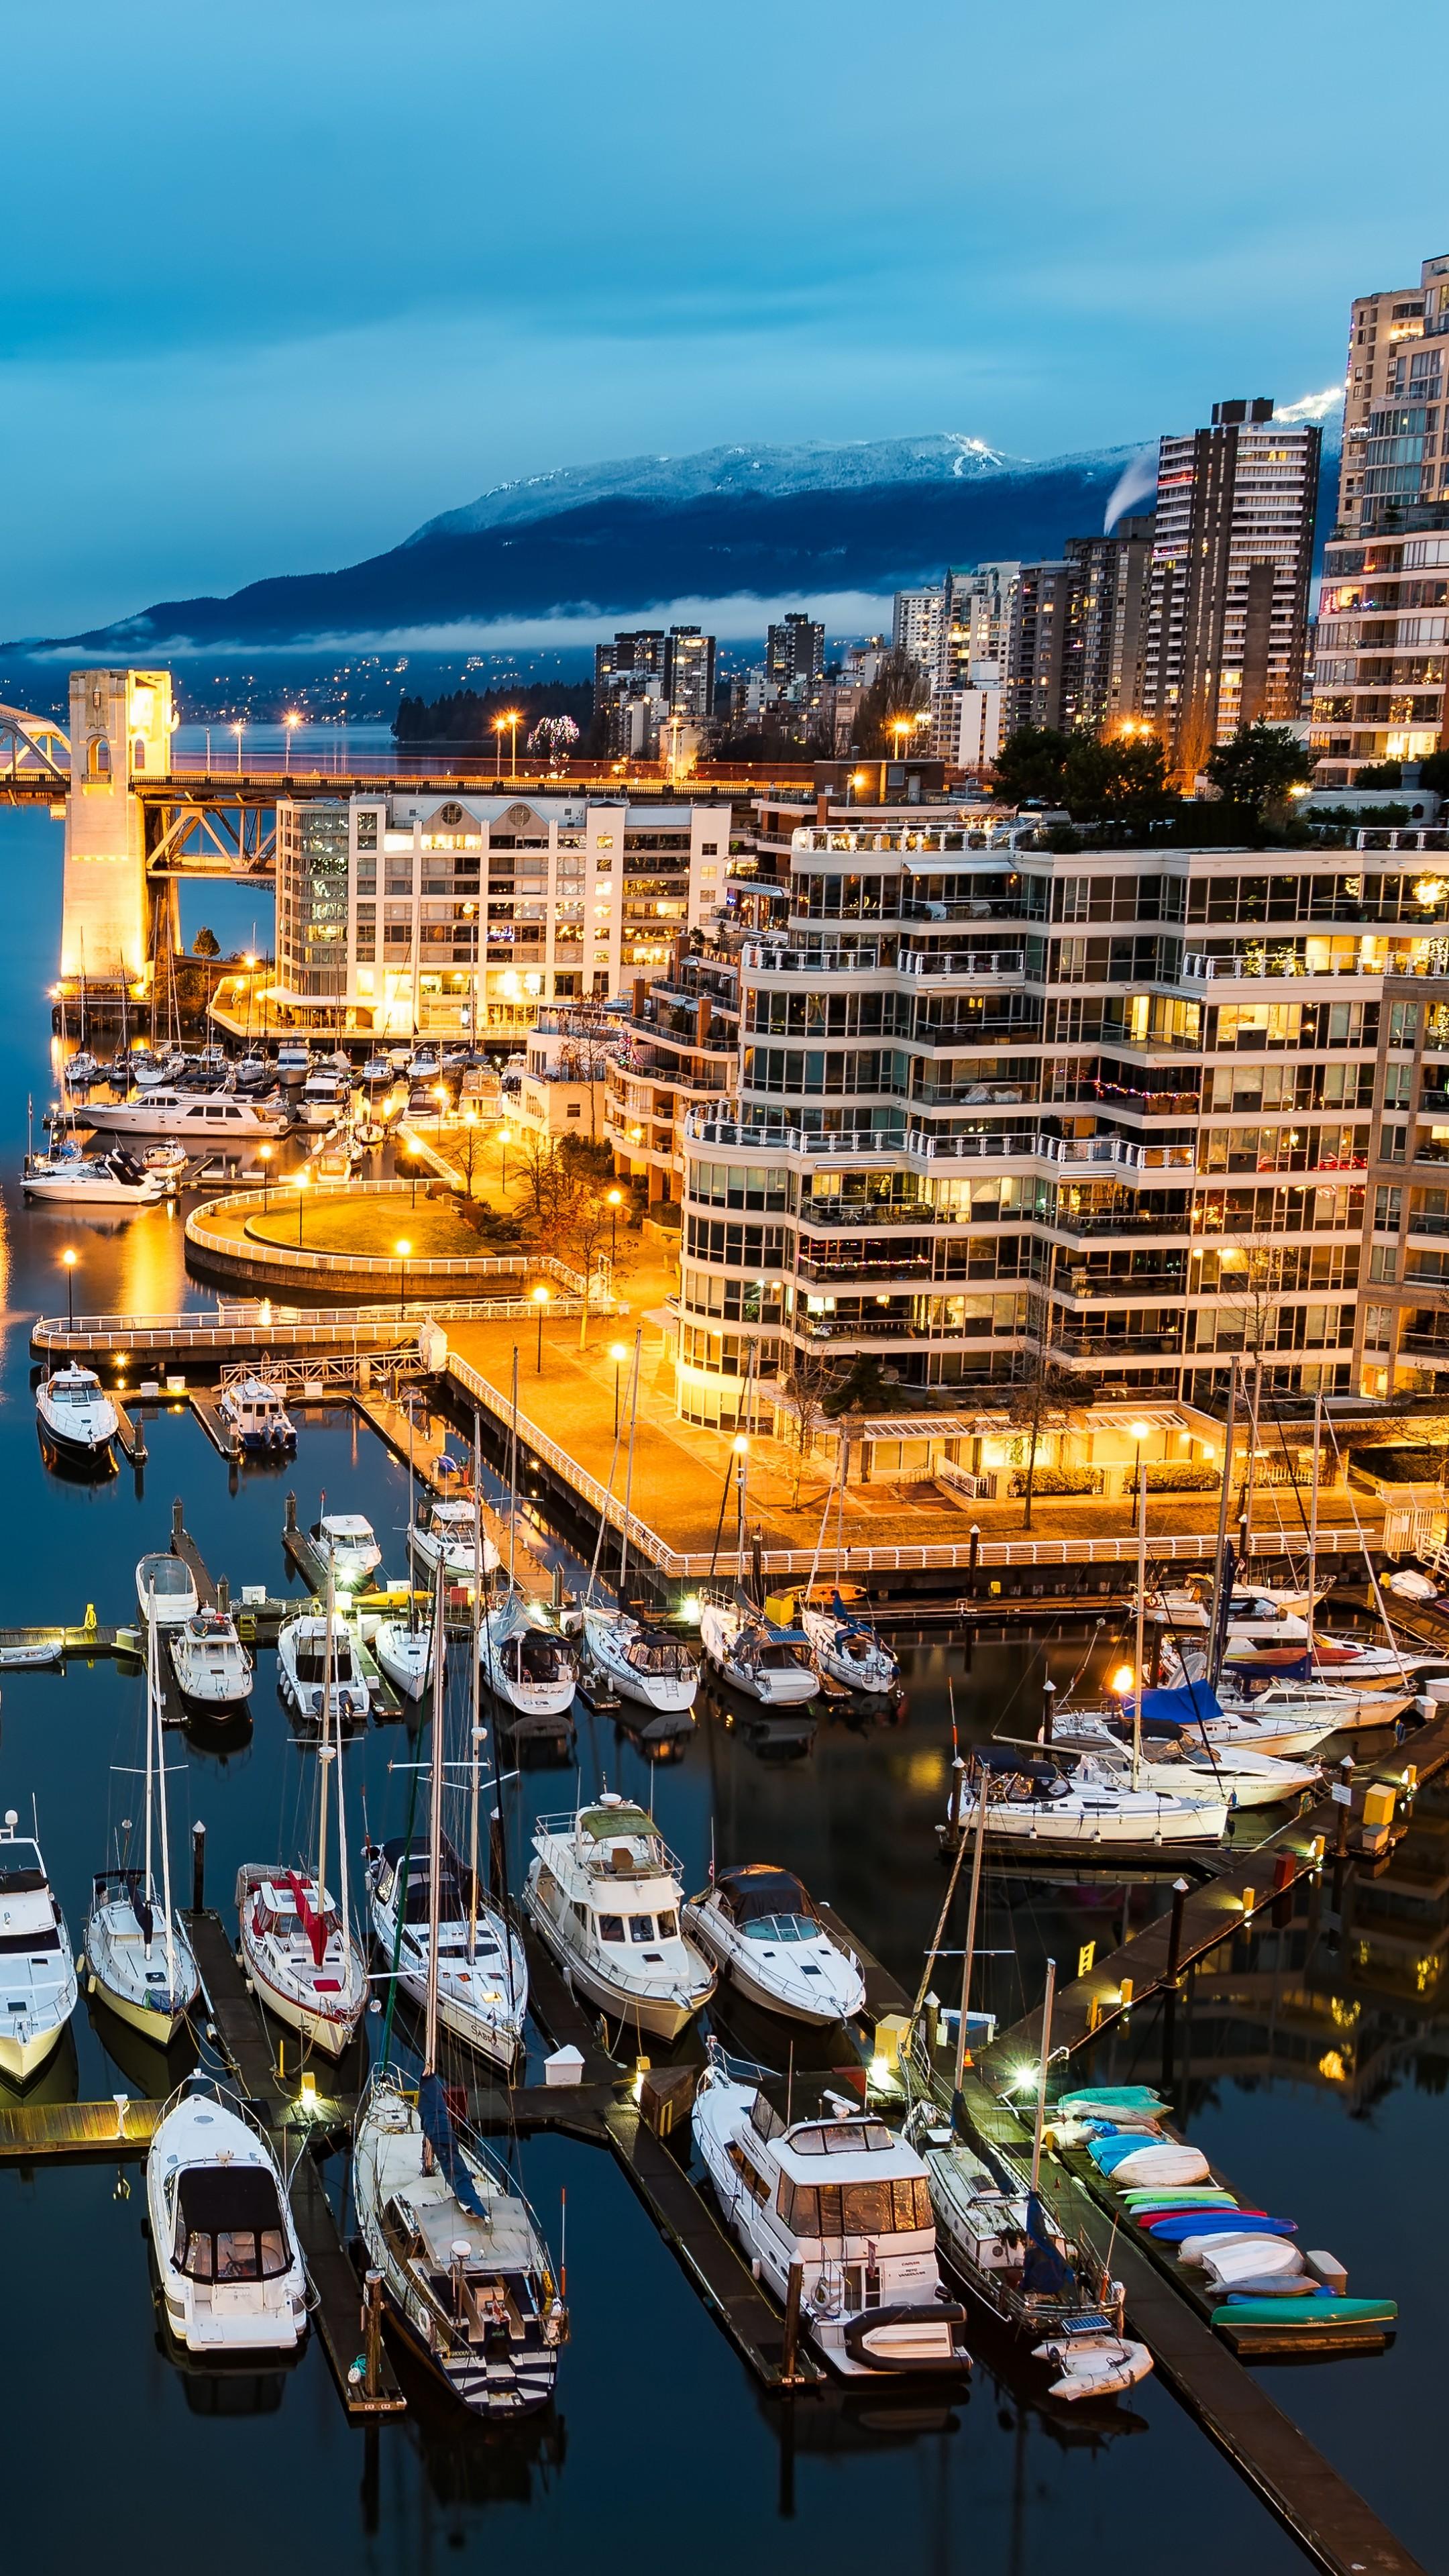 Wallpaper Vancouver Granville Island Canada night Morning lights boats blue water sea